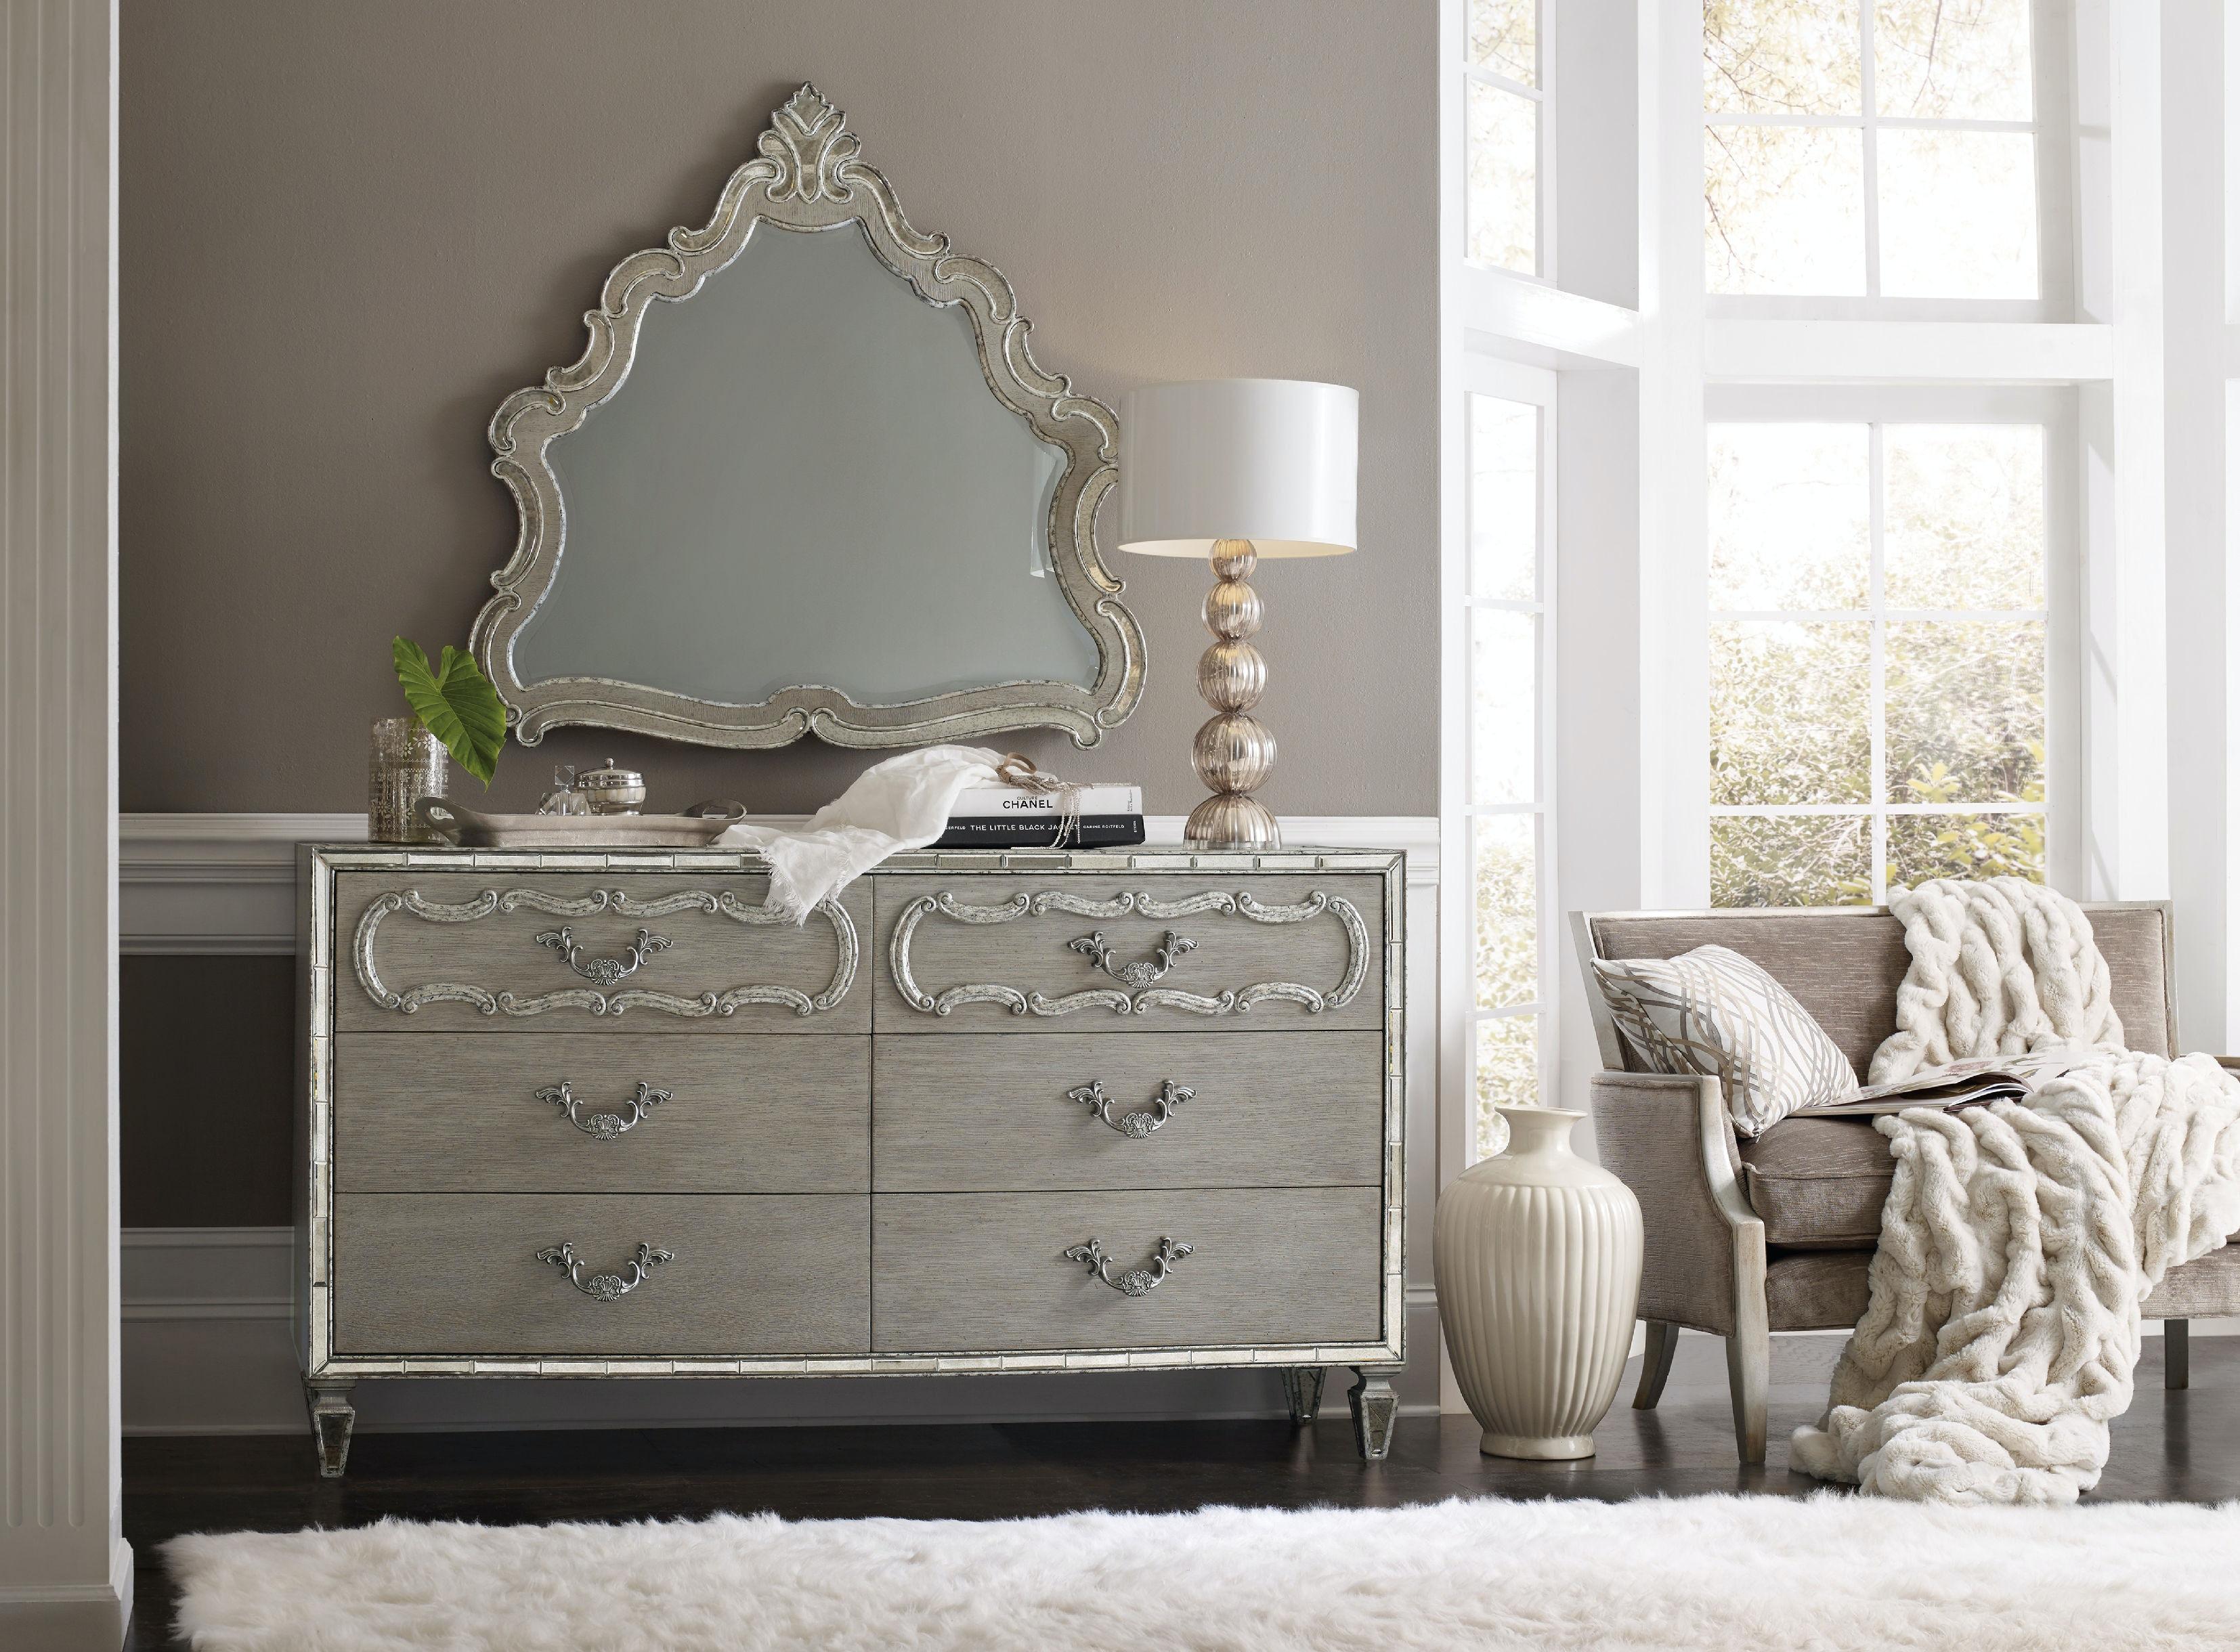 Hooker Furniture Sanctuary Shaped Mirror 5603 90008 LTBR